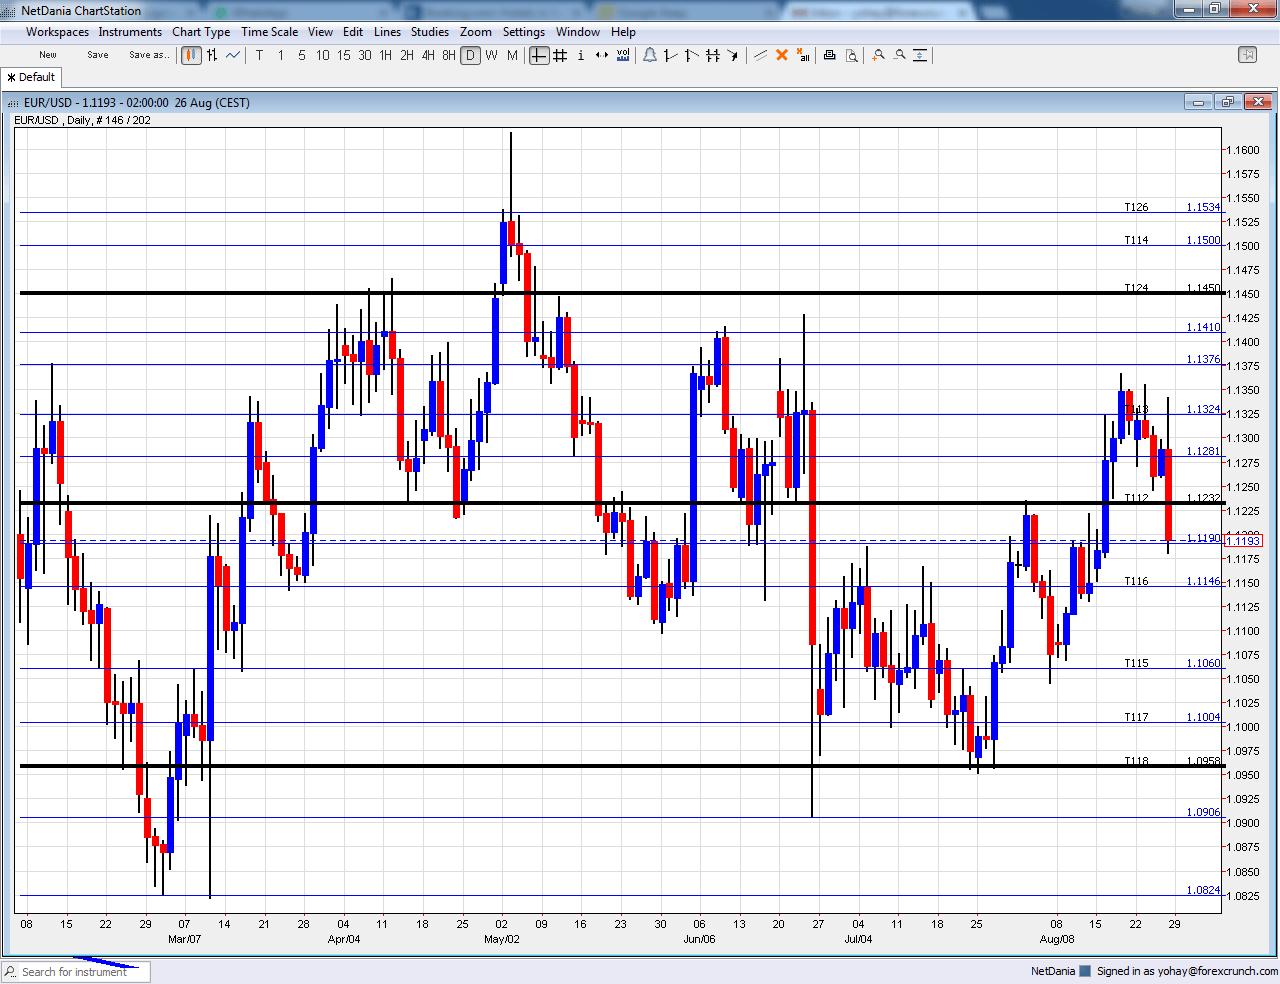 EURUSD September 2016 technical analysis chart down